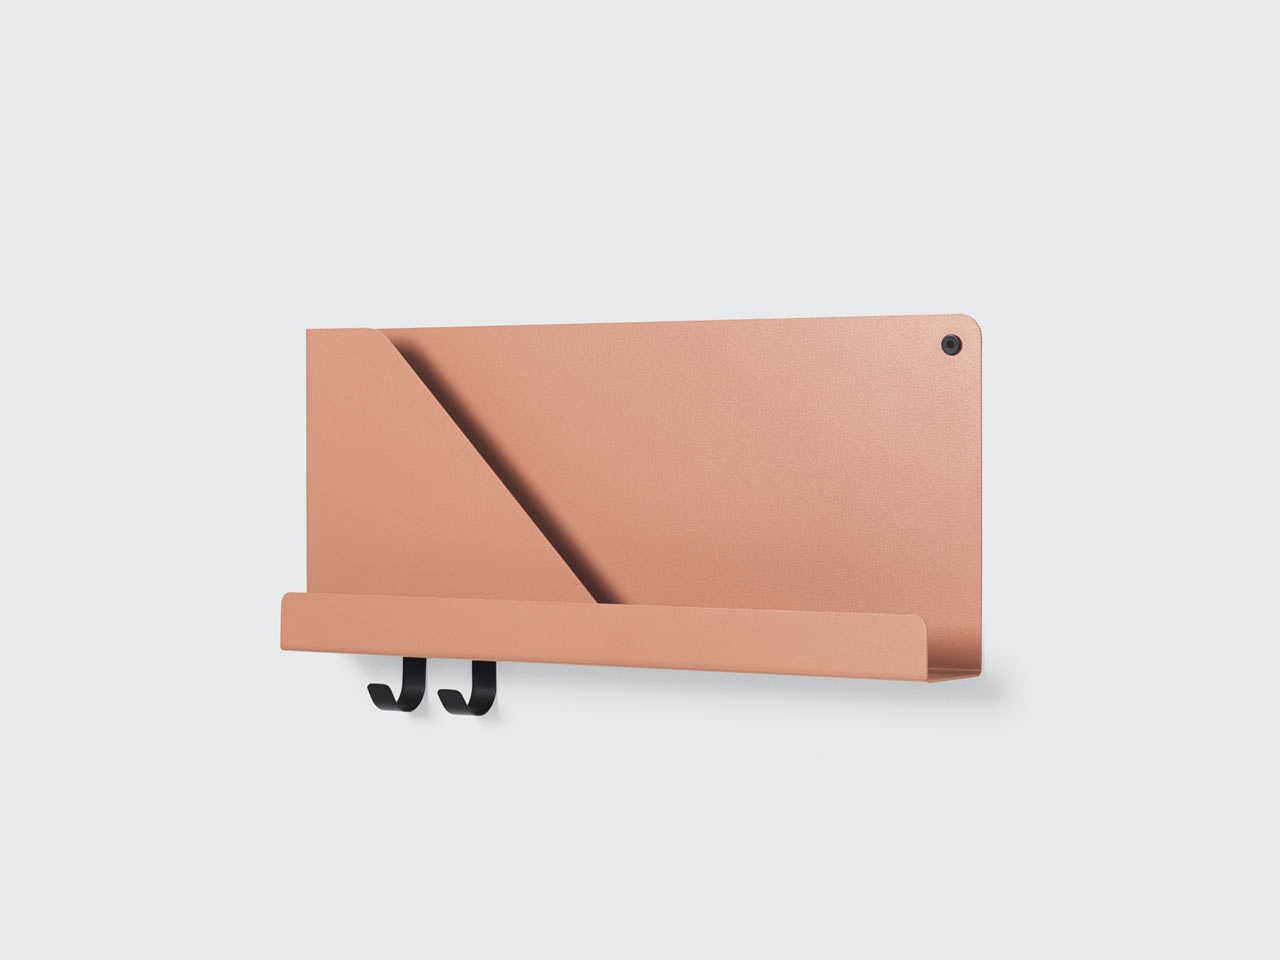 Folded-Shelf-Muuto-Johan-van-Hengel-15